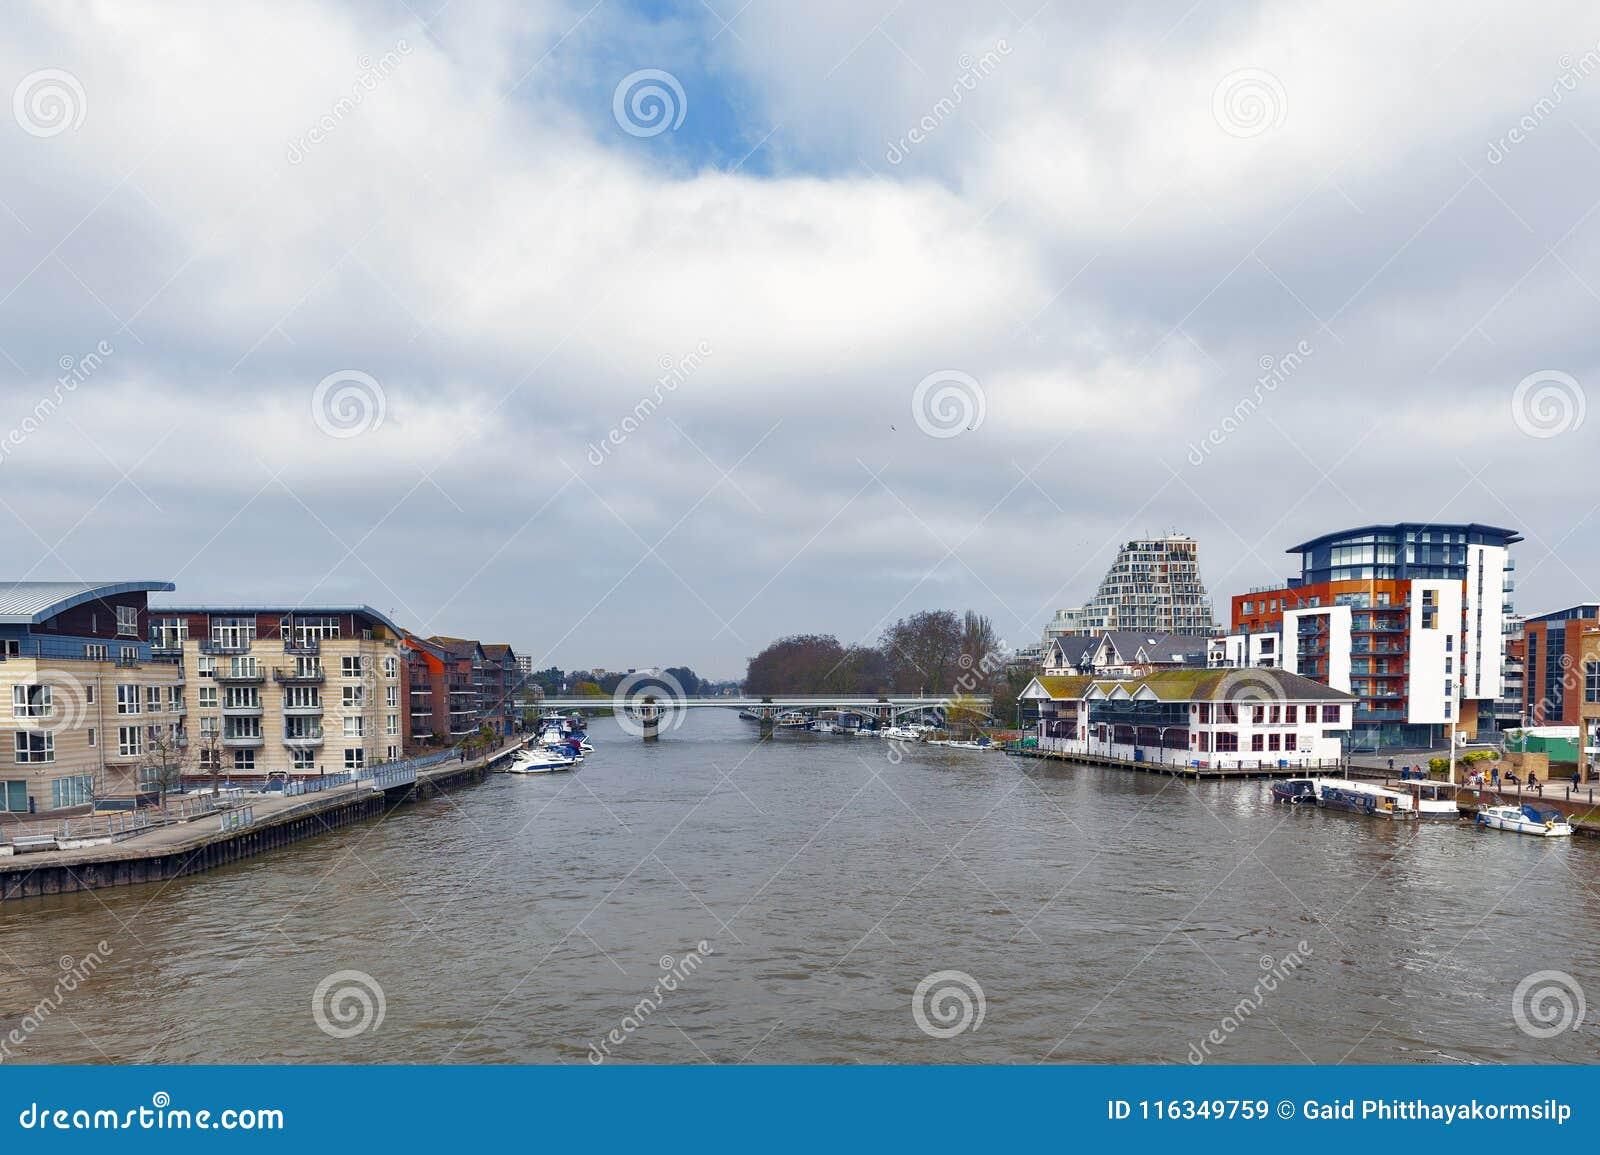 river thames united kingdom